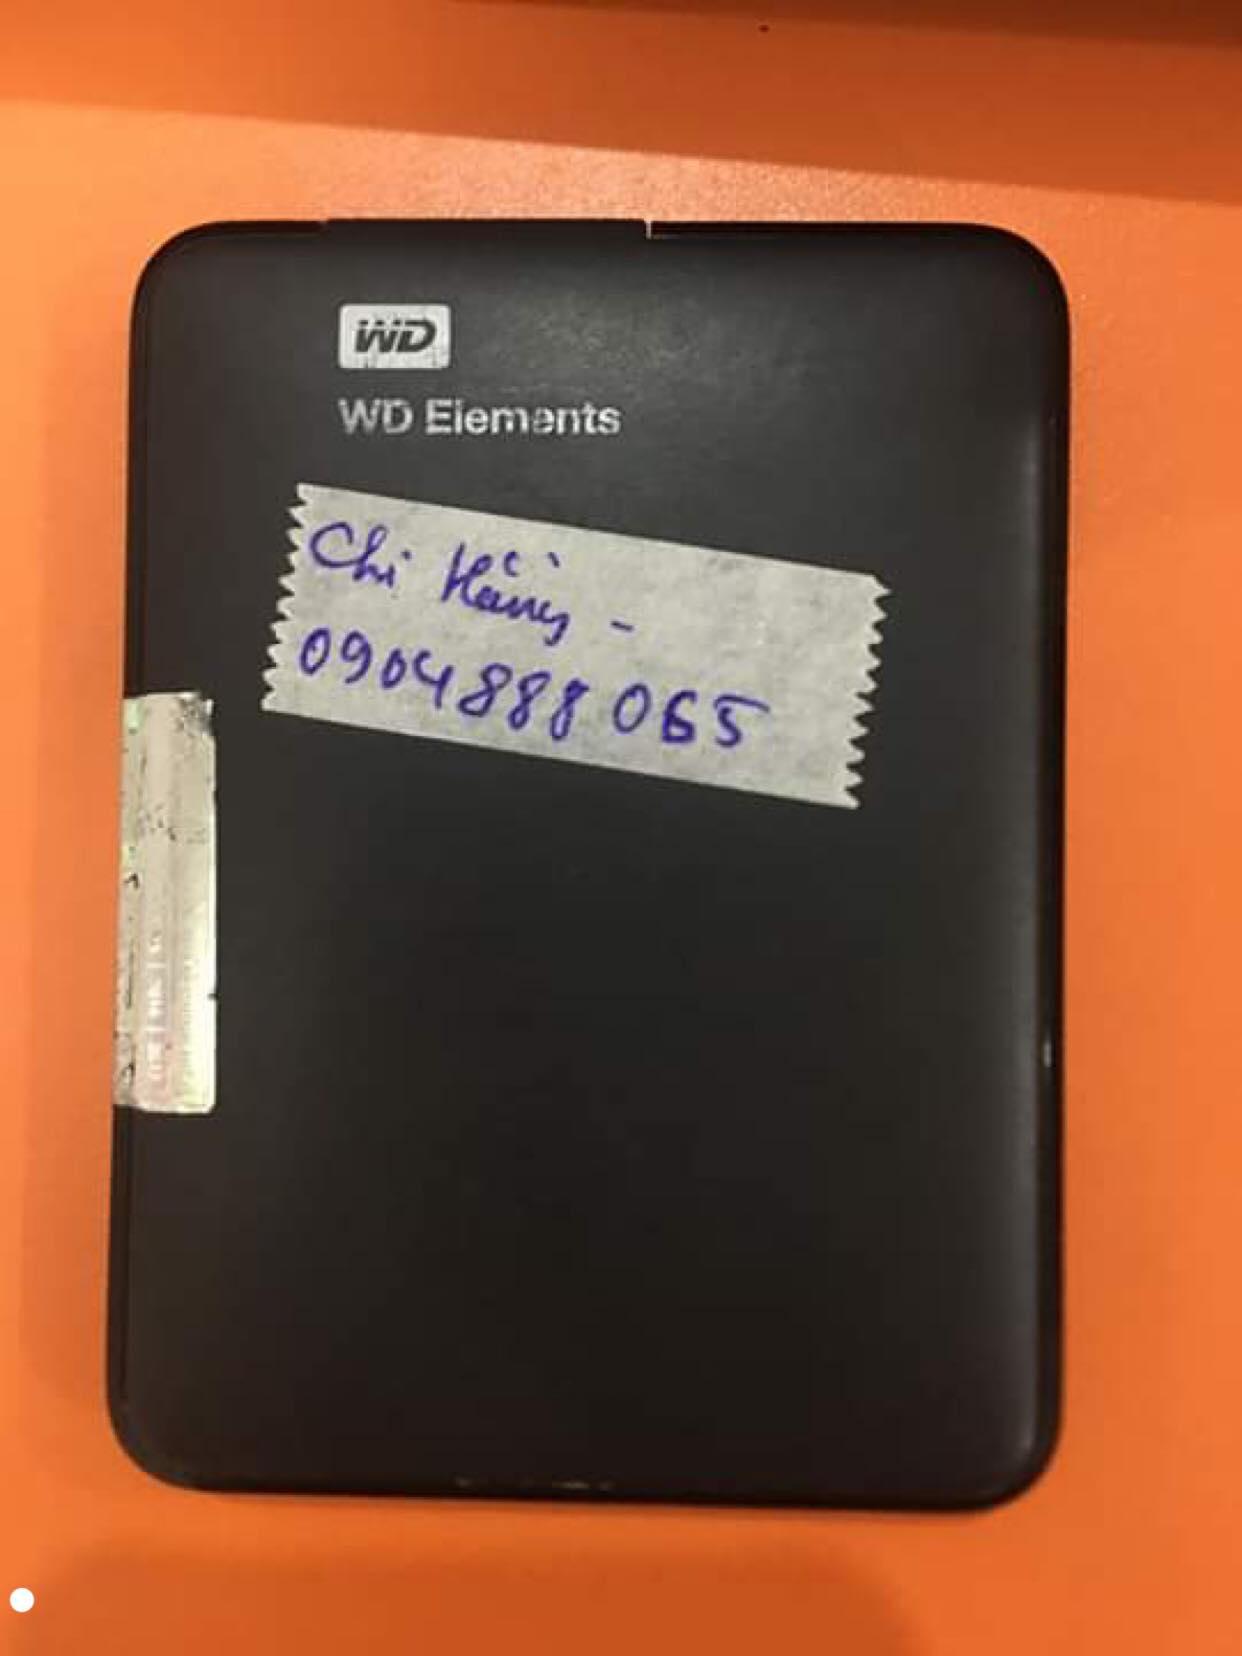 Phục hồi dữ liệu ổ cứng Western 1TB lỗi cơ 11/10/2019 - cuumaytinh